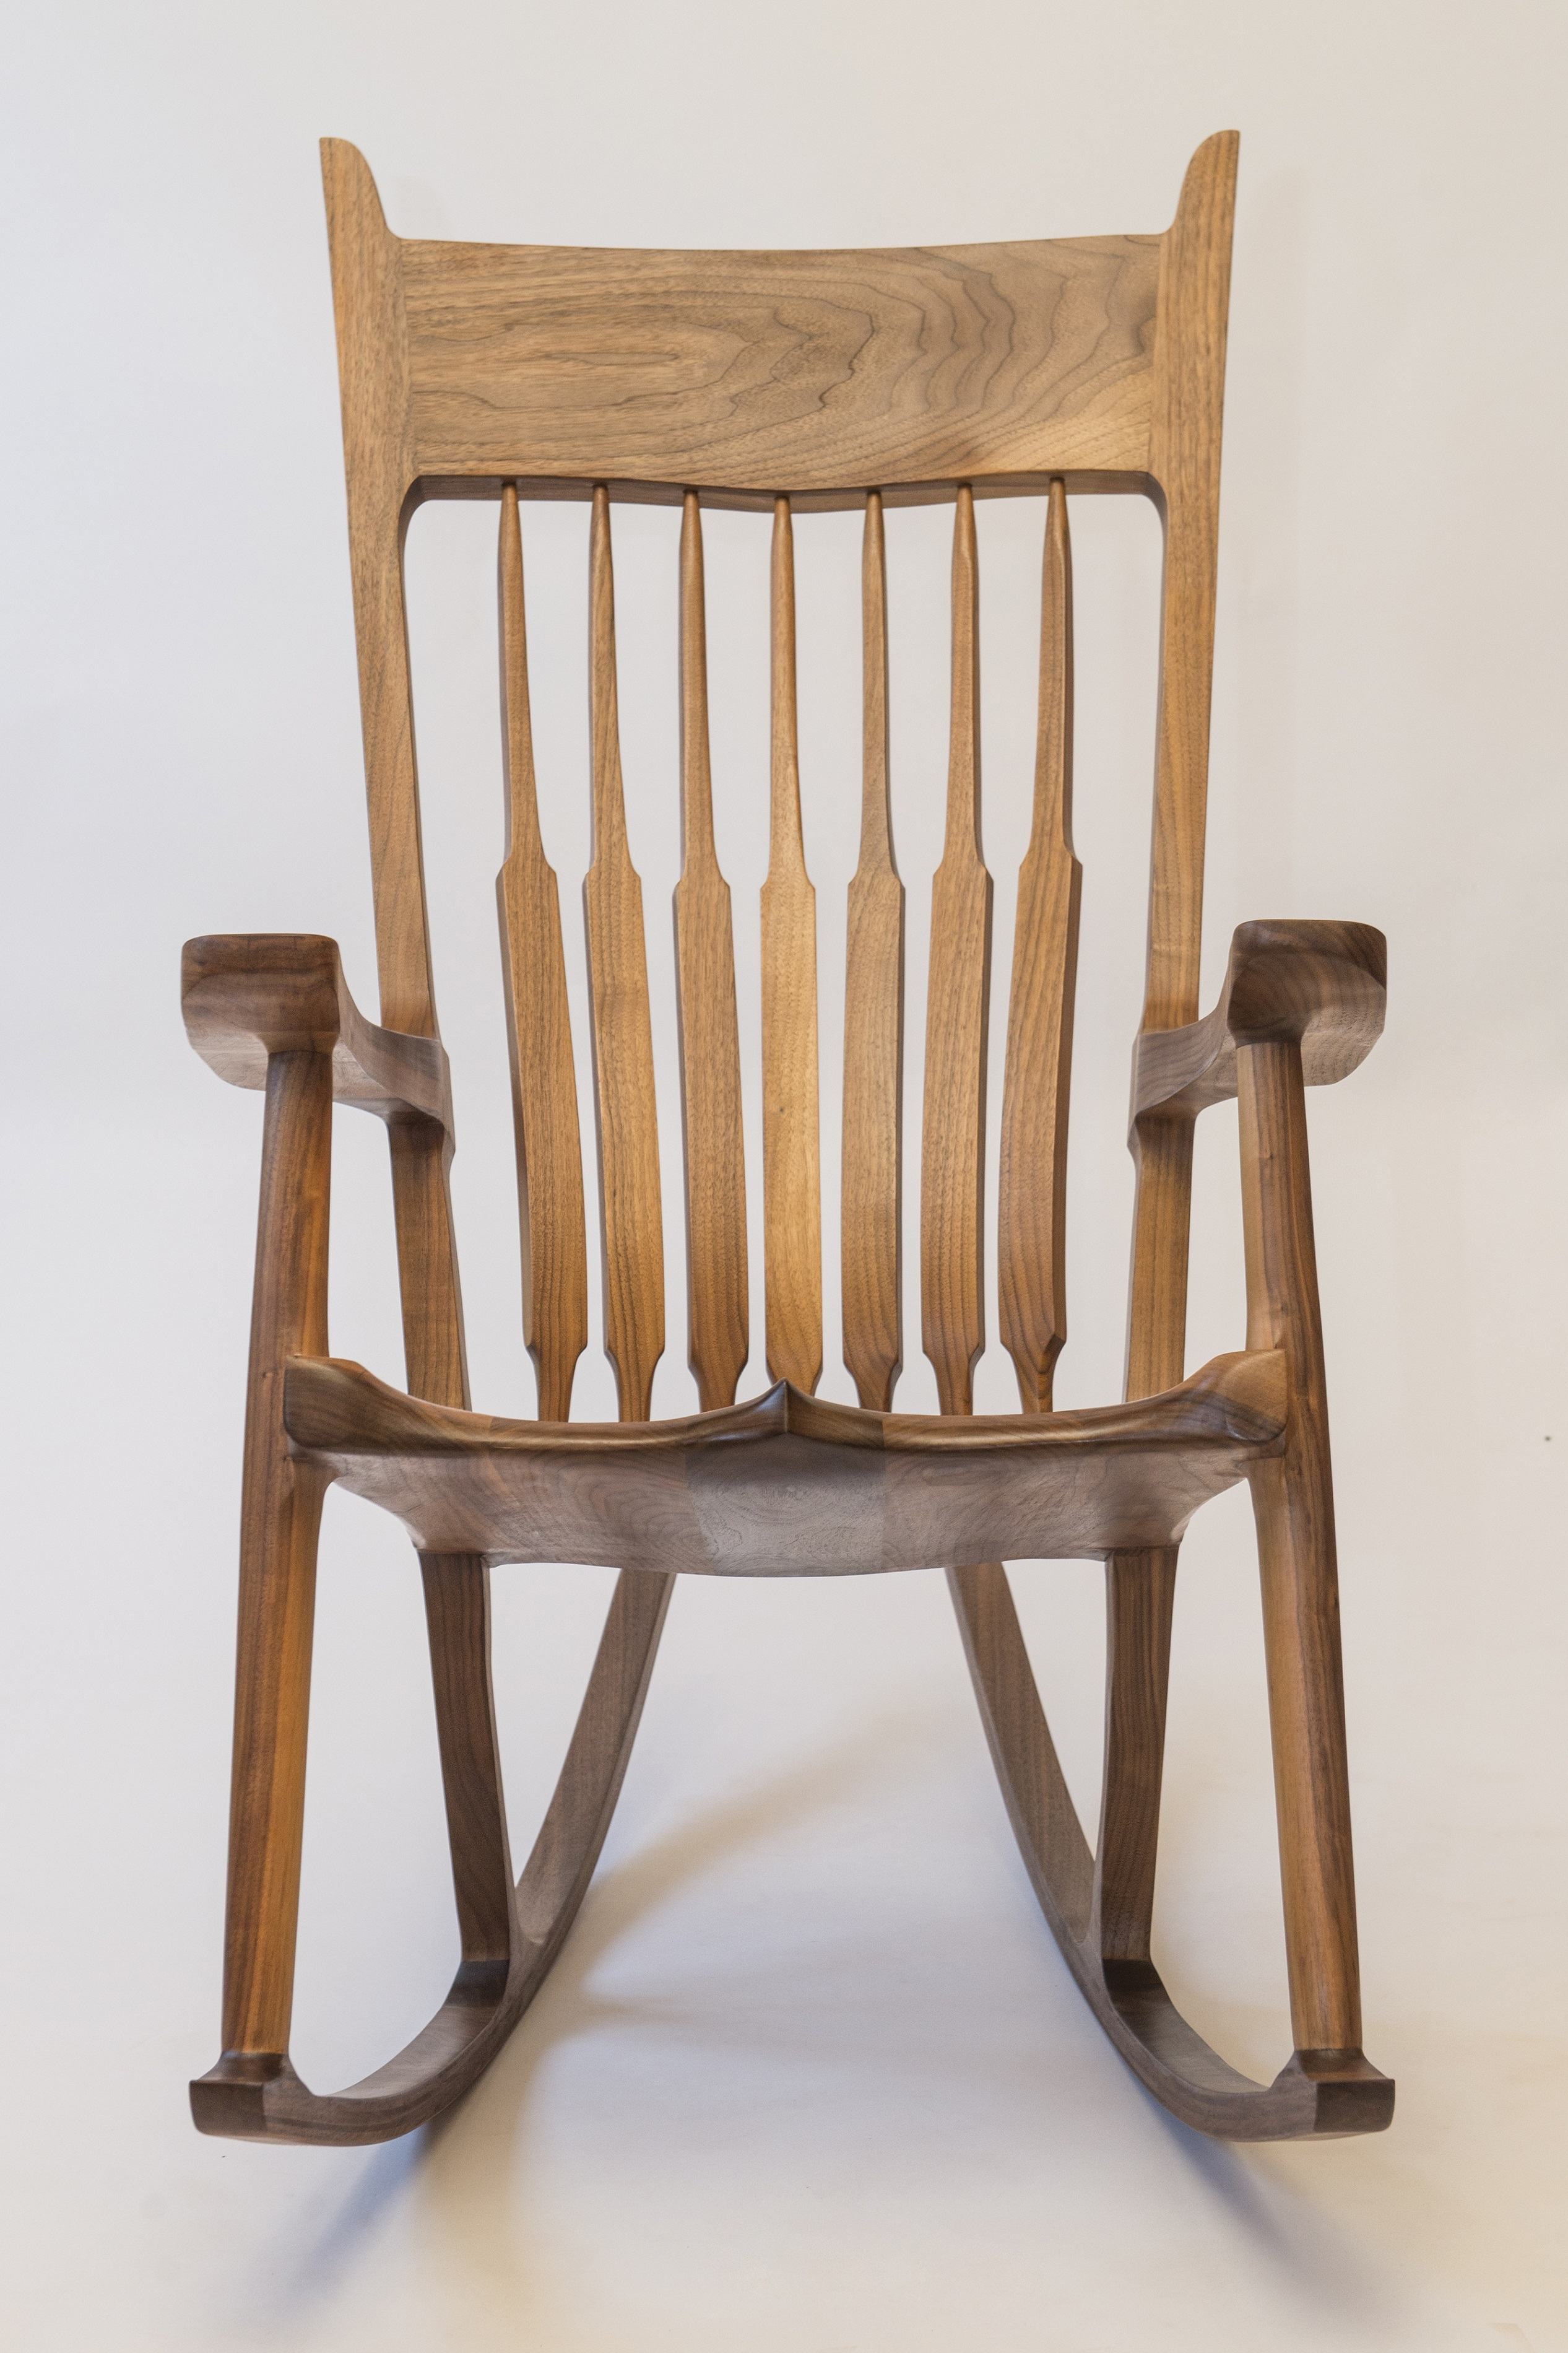 Gallery Bespoke Furniture Bespoke Furniture Maker Fine